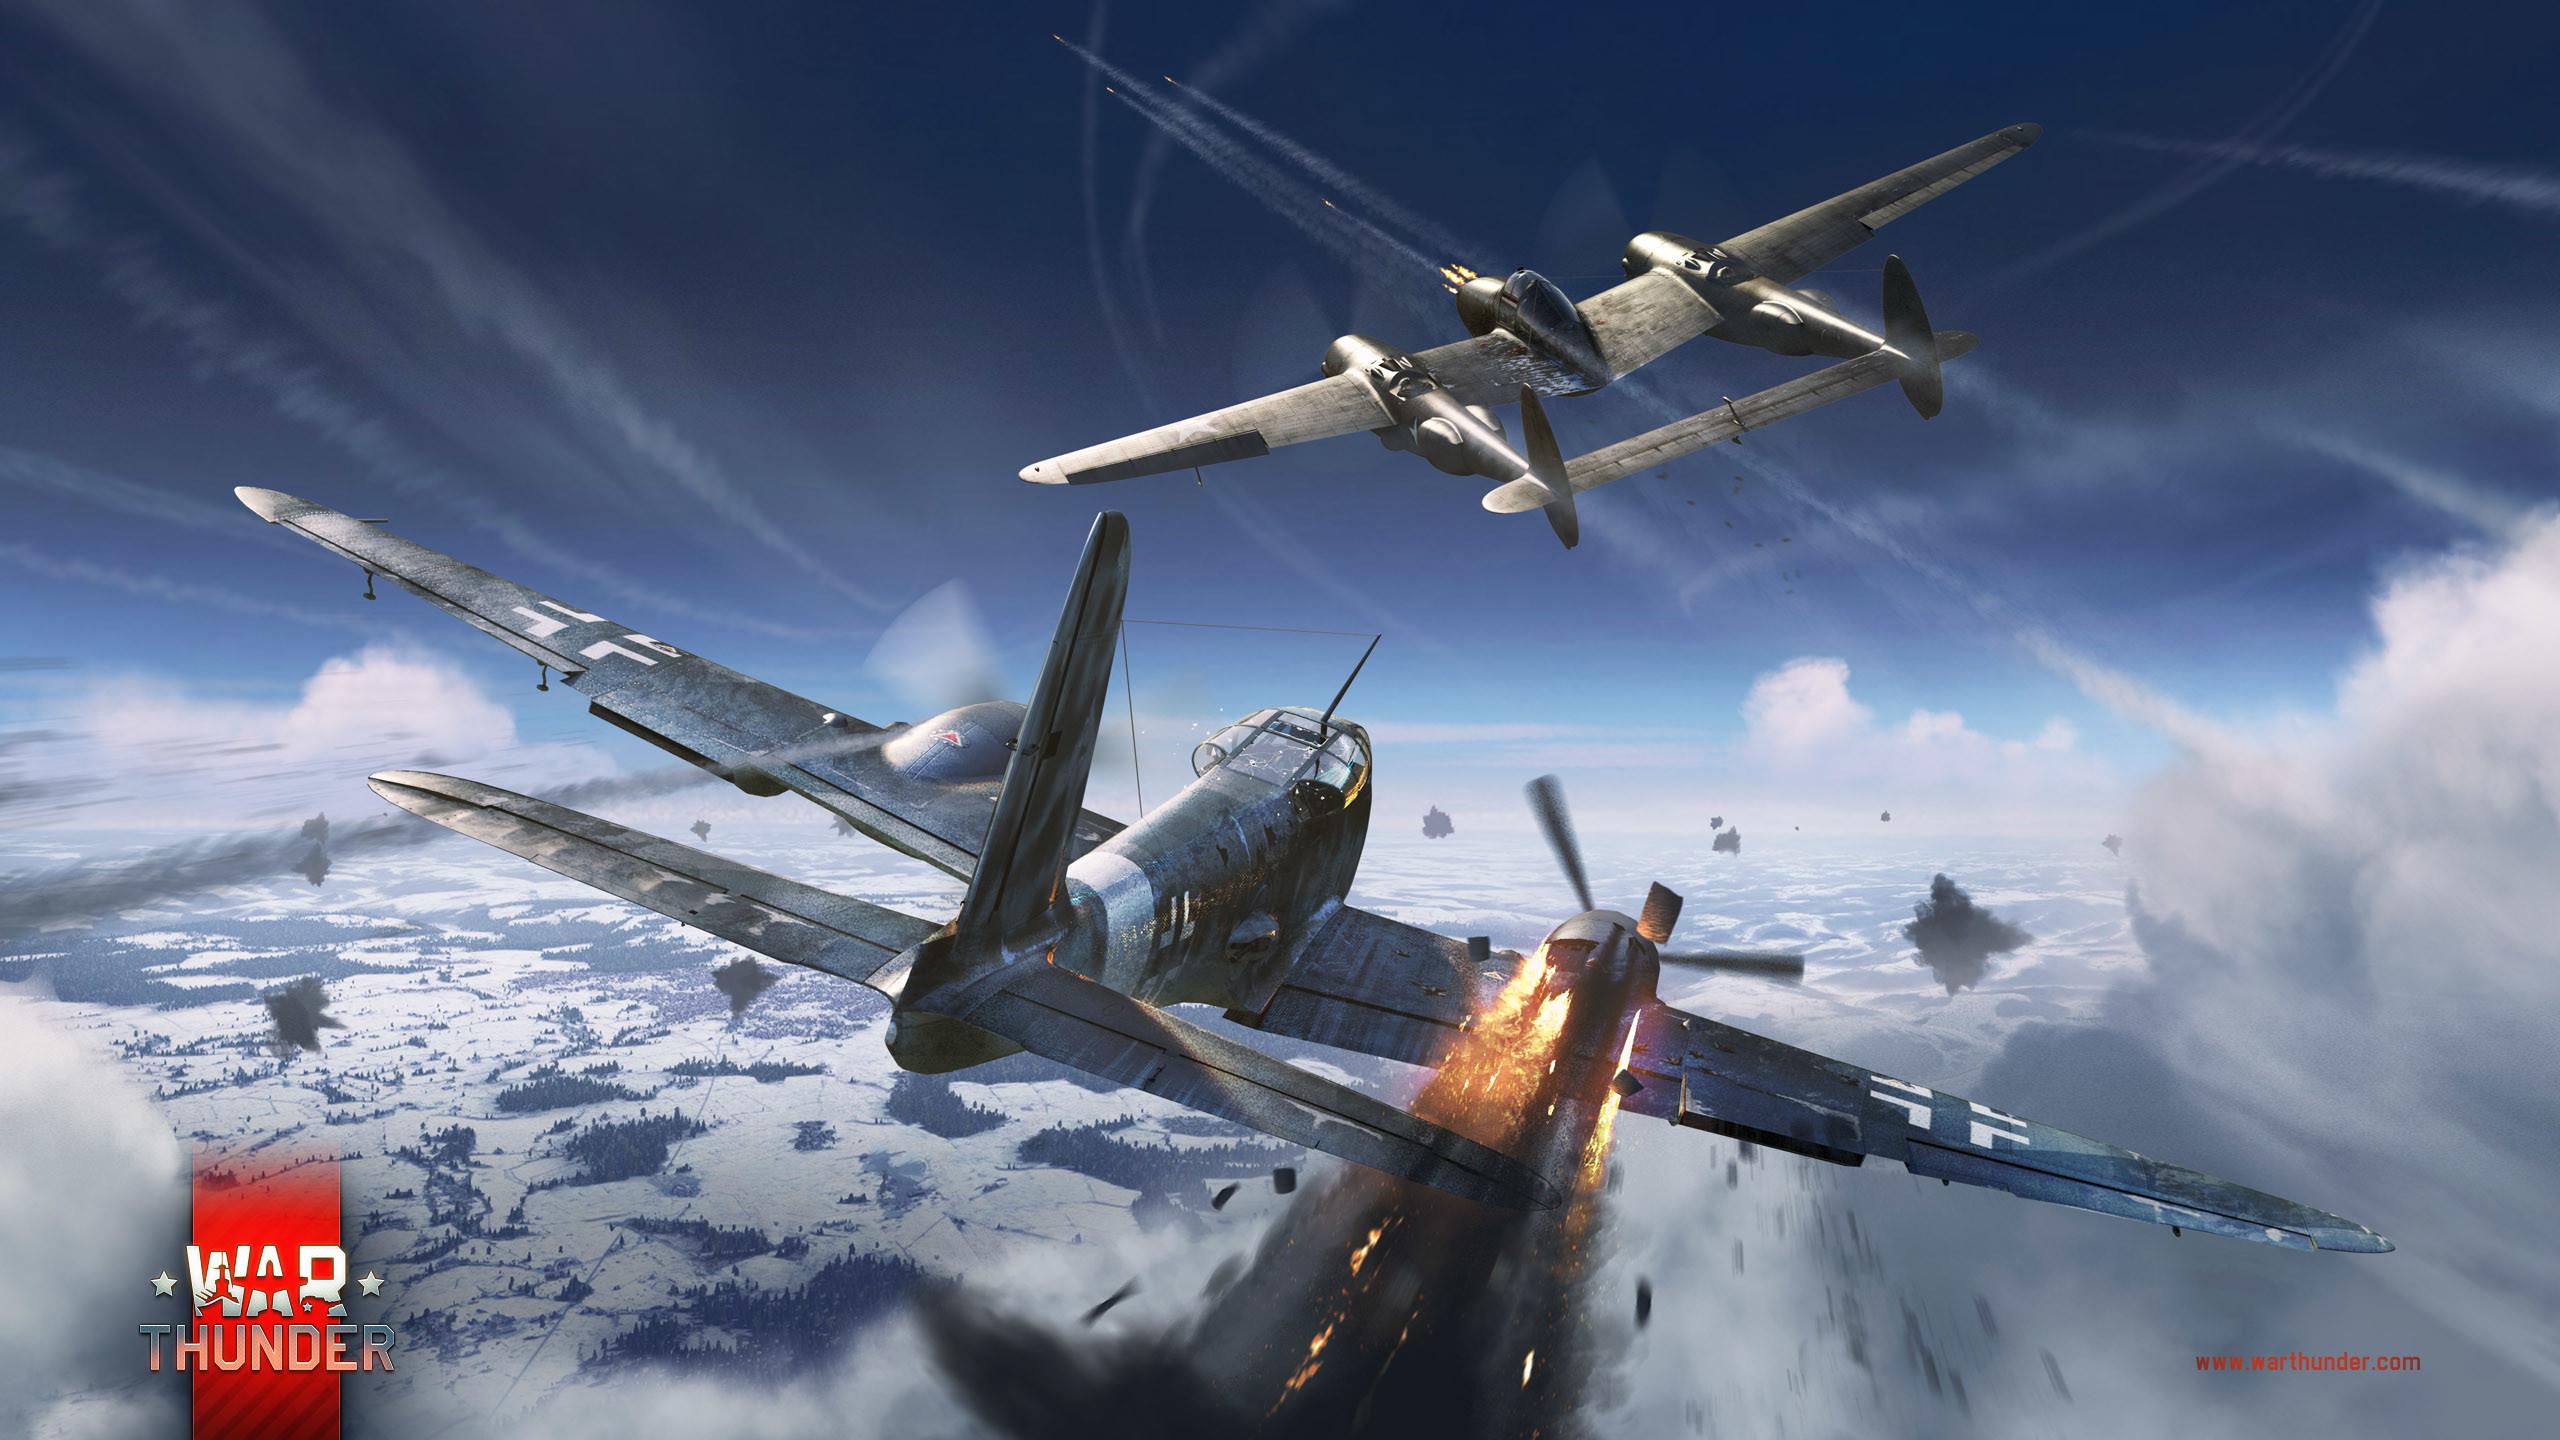 Res: 2560x1440, War Thunder HD Wallpapers